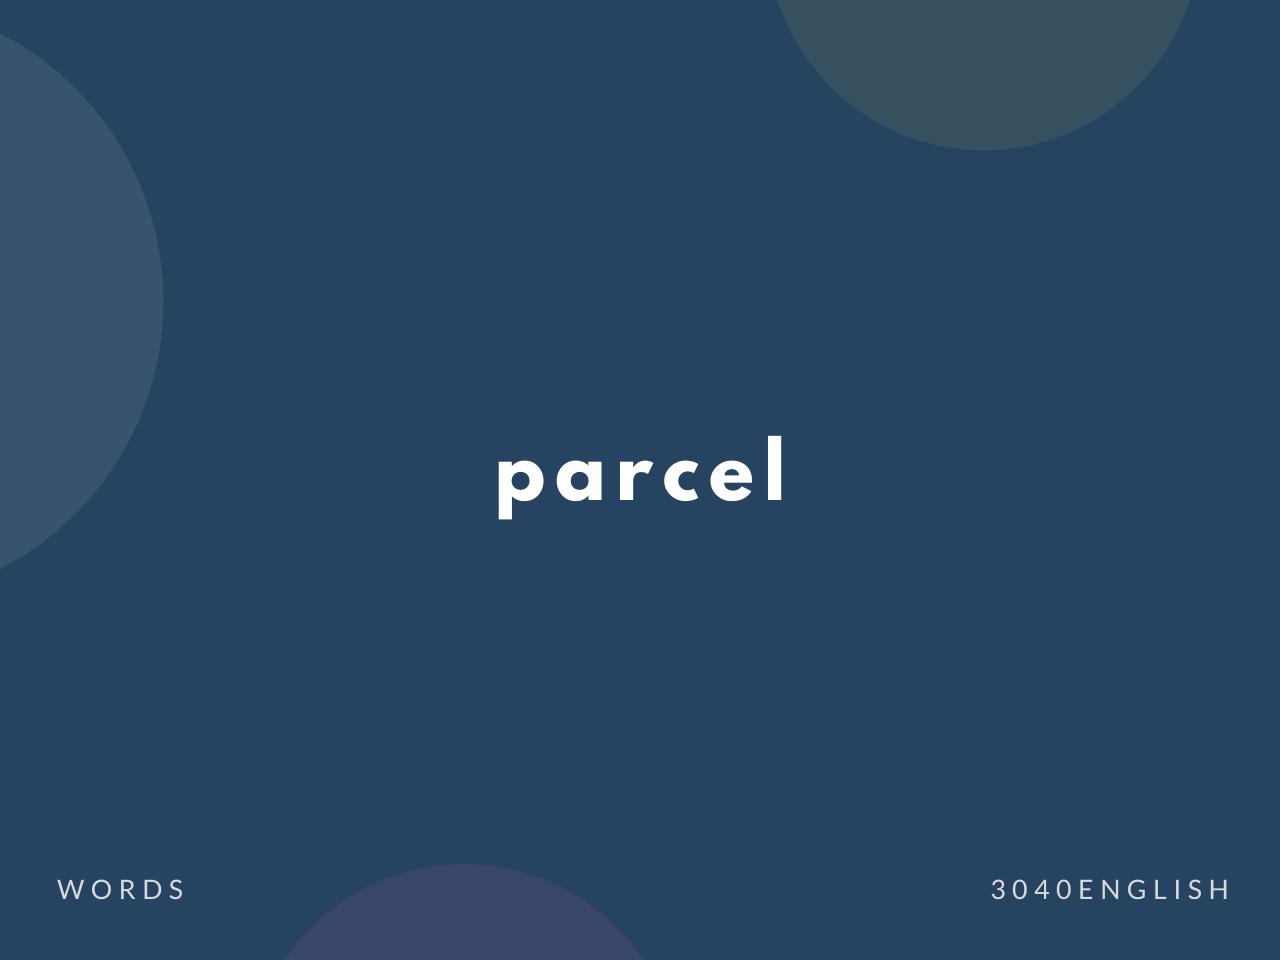 parcel の意味と簡単な使い方【音読用例文あり】